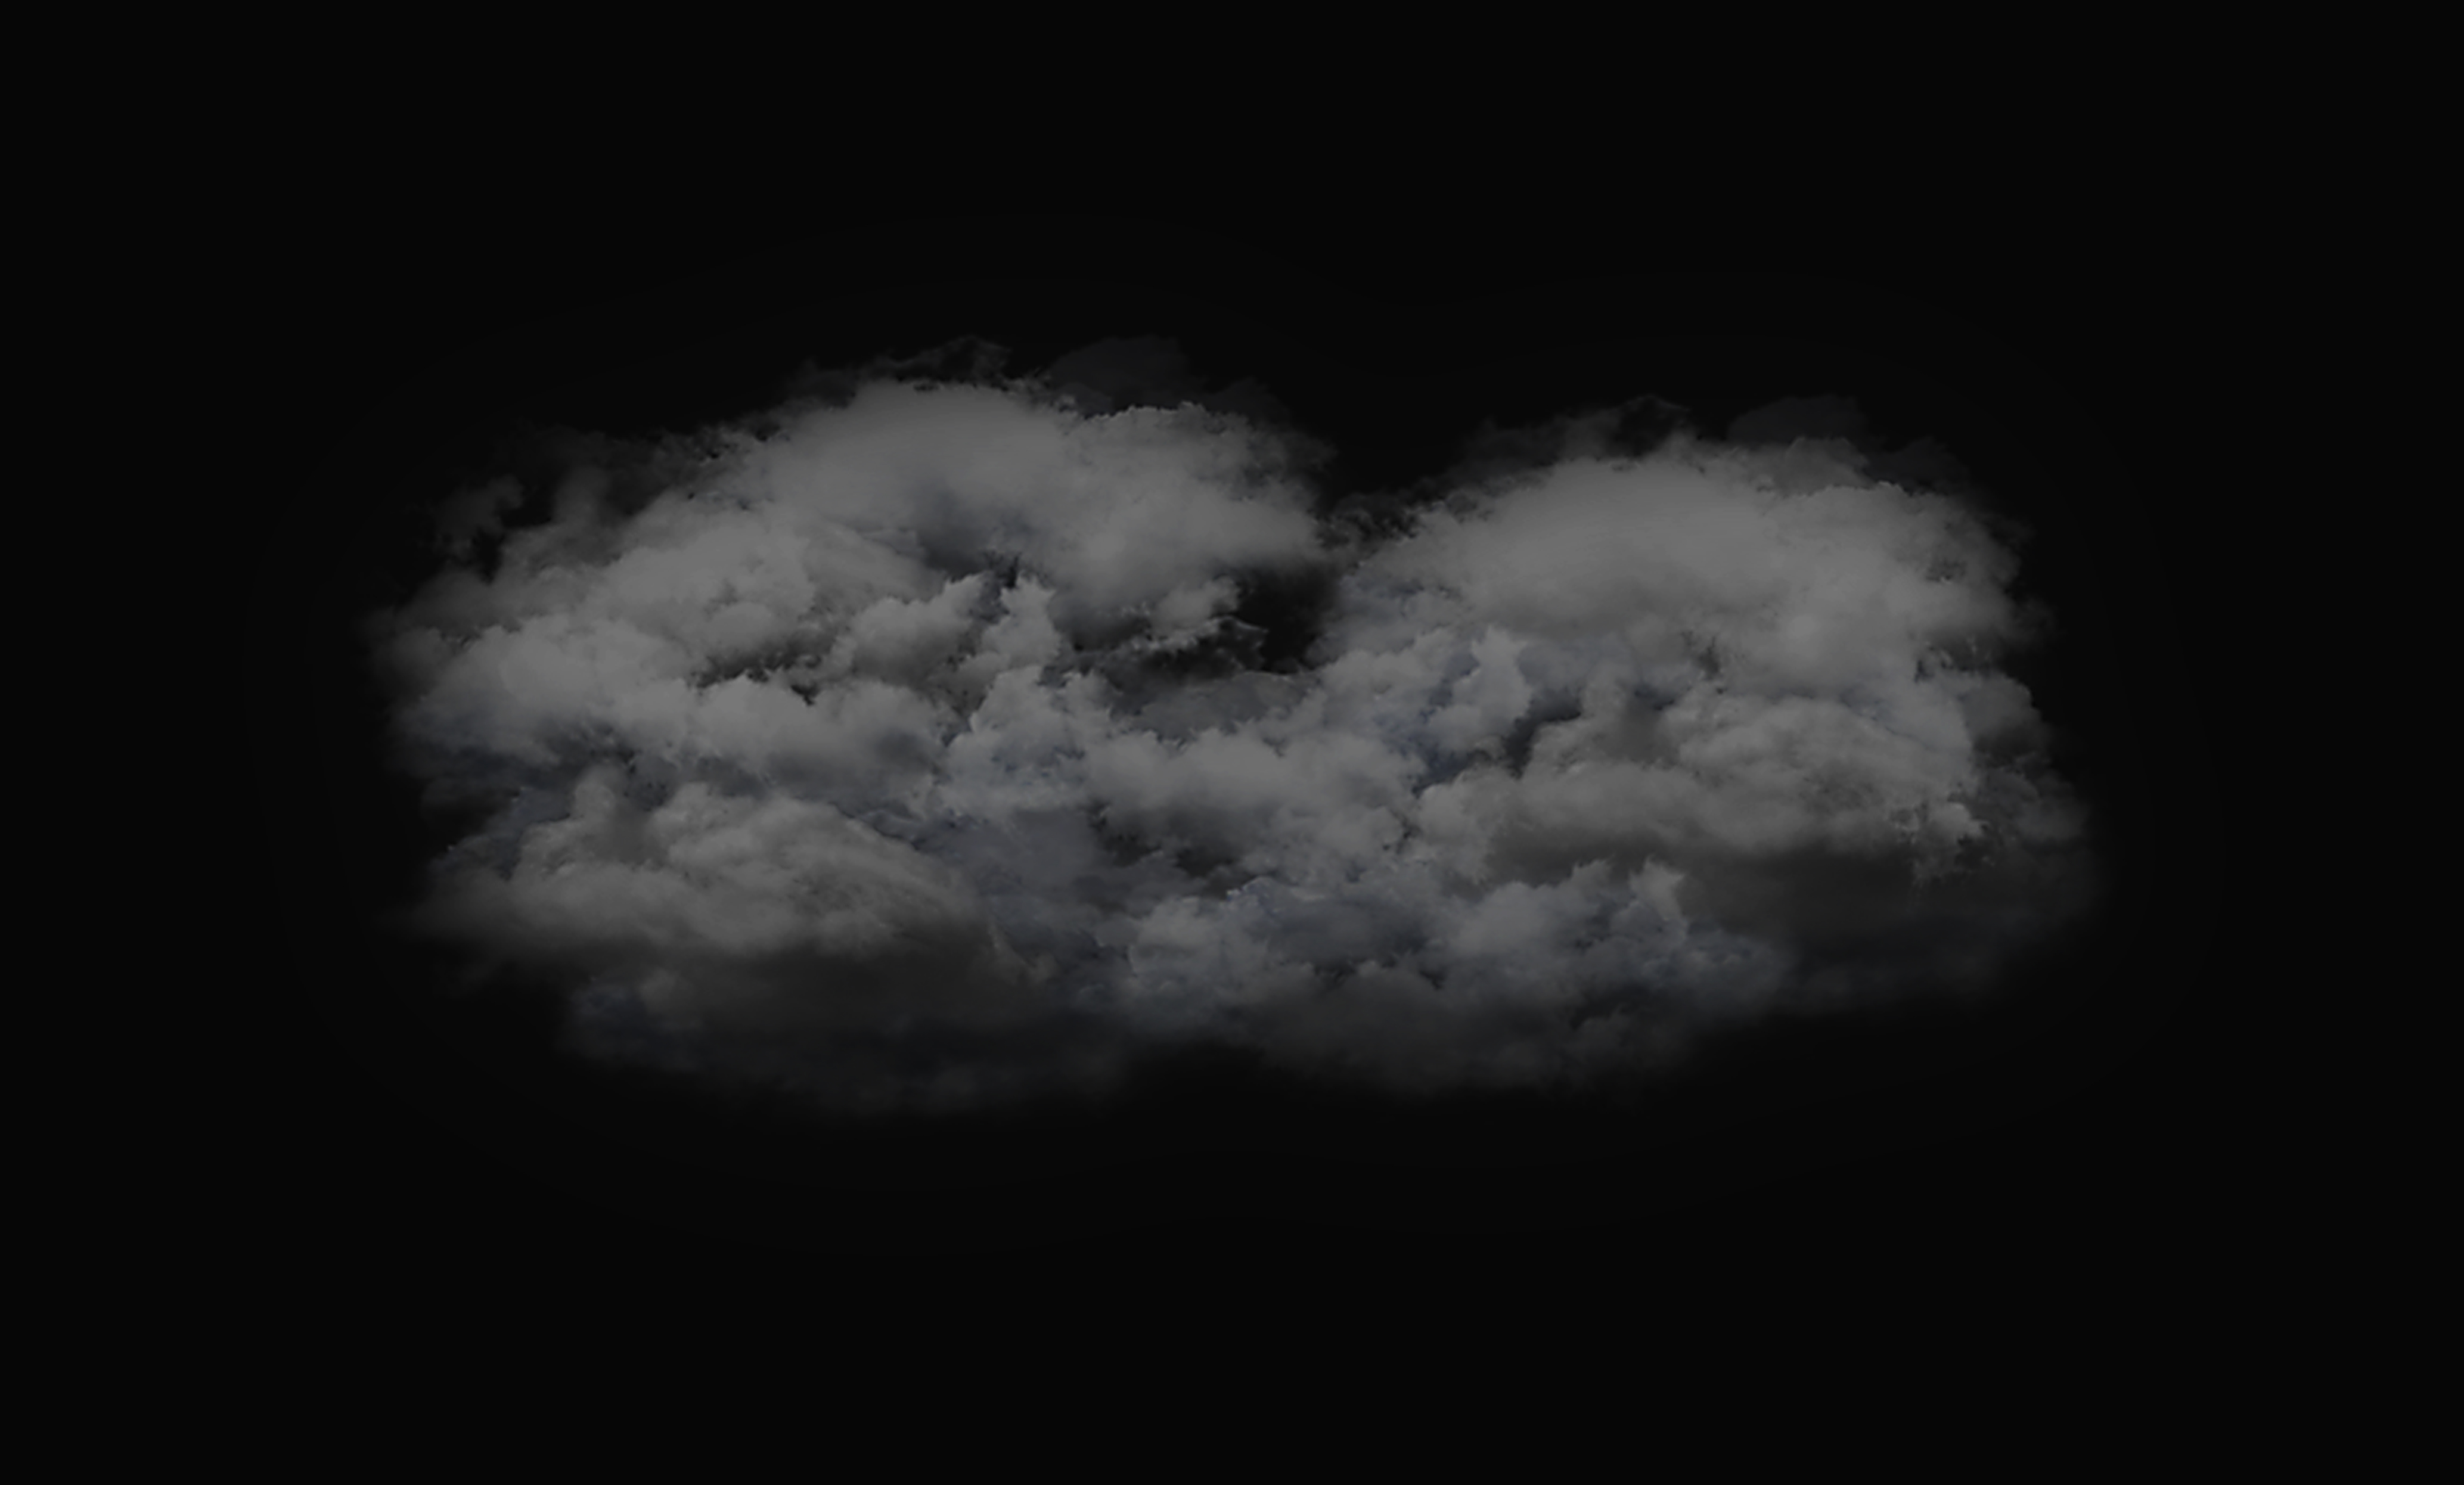 Ill.3: Alfredo Jaar, The Cloud, 2015, Approx. 600 x 600 x 100 cm, plaster, bandages, ballons, polyester fibre. © Alfredo Jaar